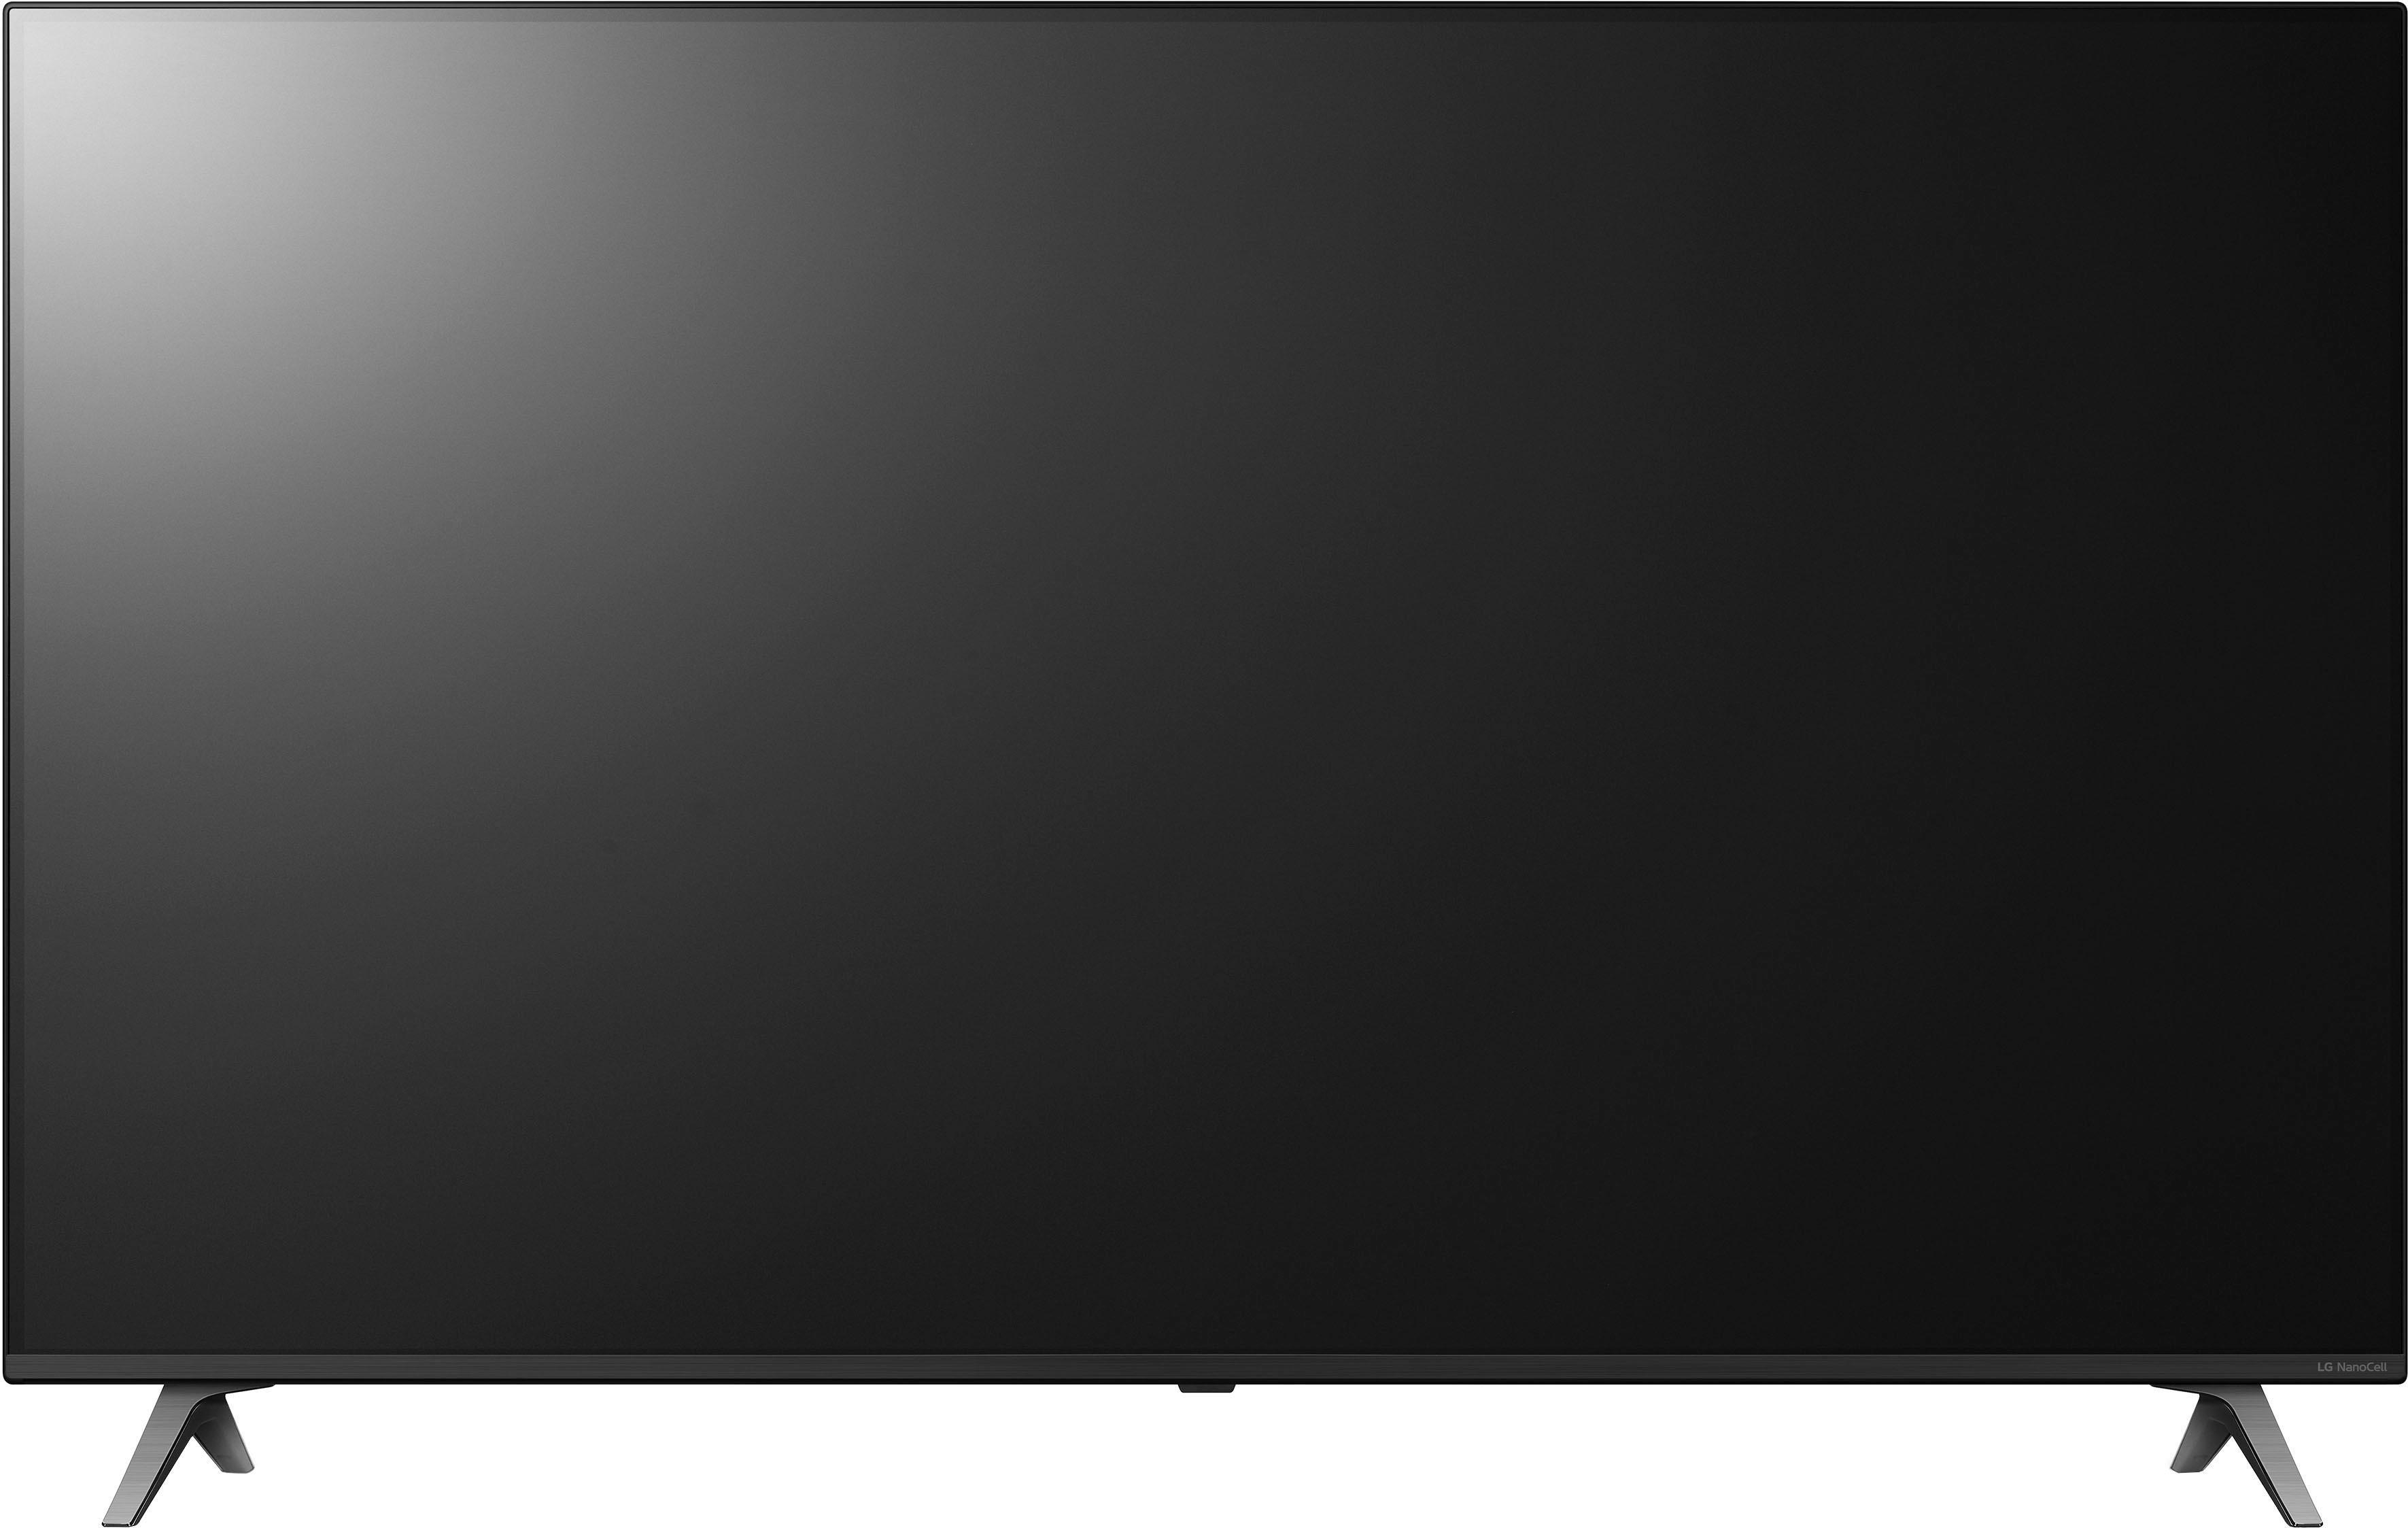 LG 65SM8050PLC LED-televisie (164 cm / (65 Inch), 4K Ultra HD, Smart-TV bestellen: 30 dagen bedenktijd